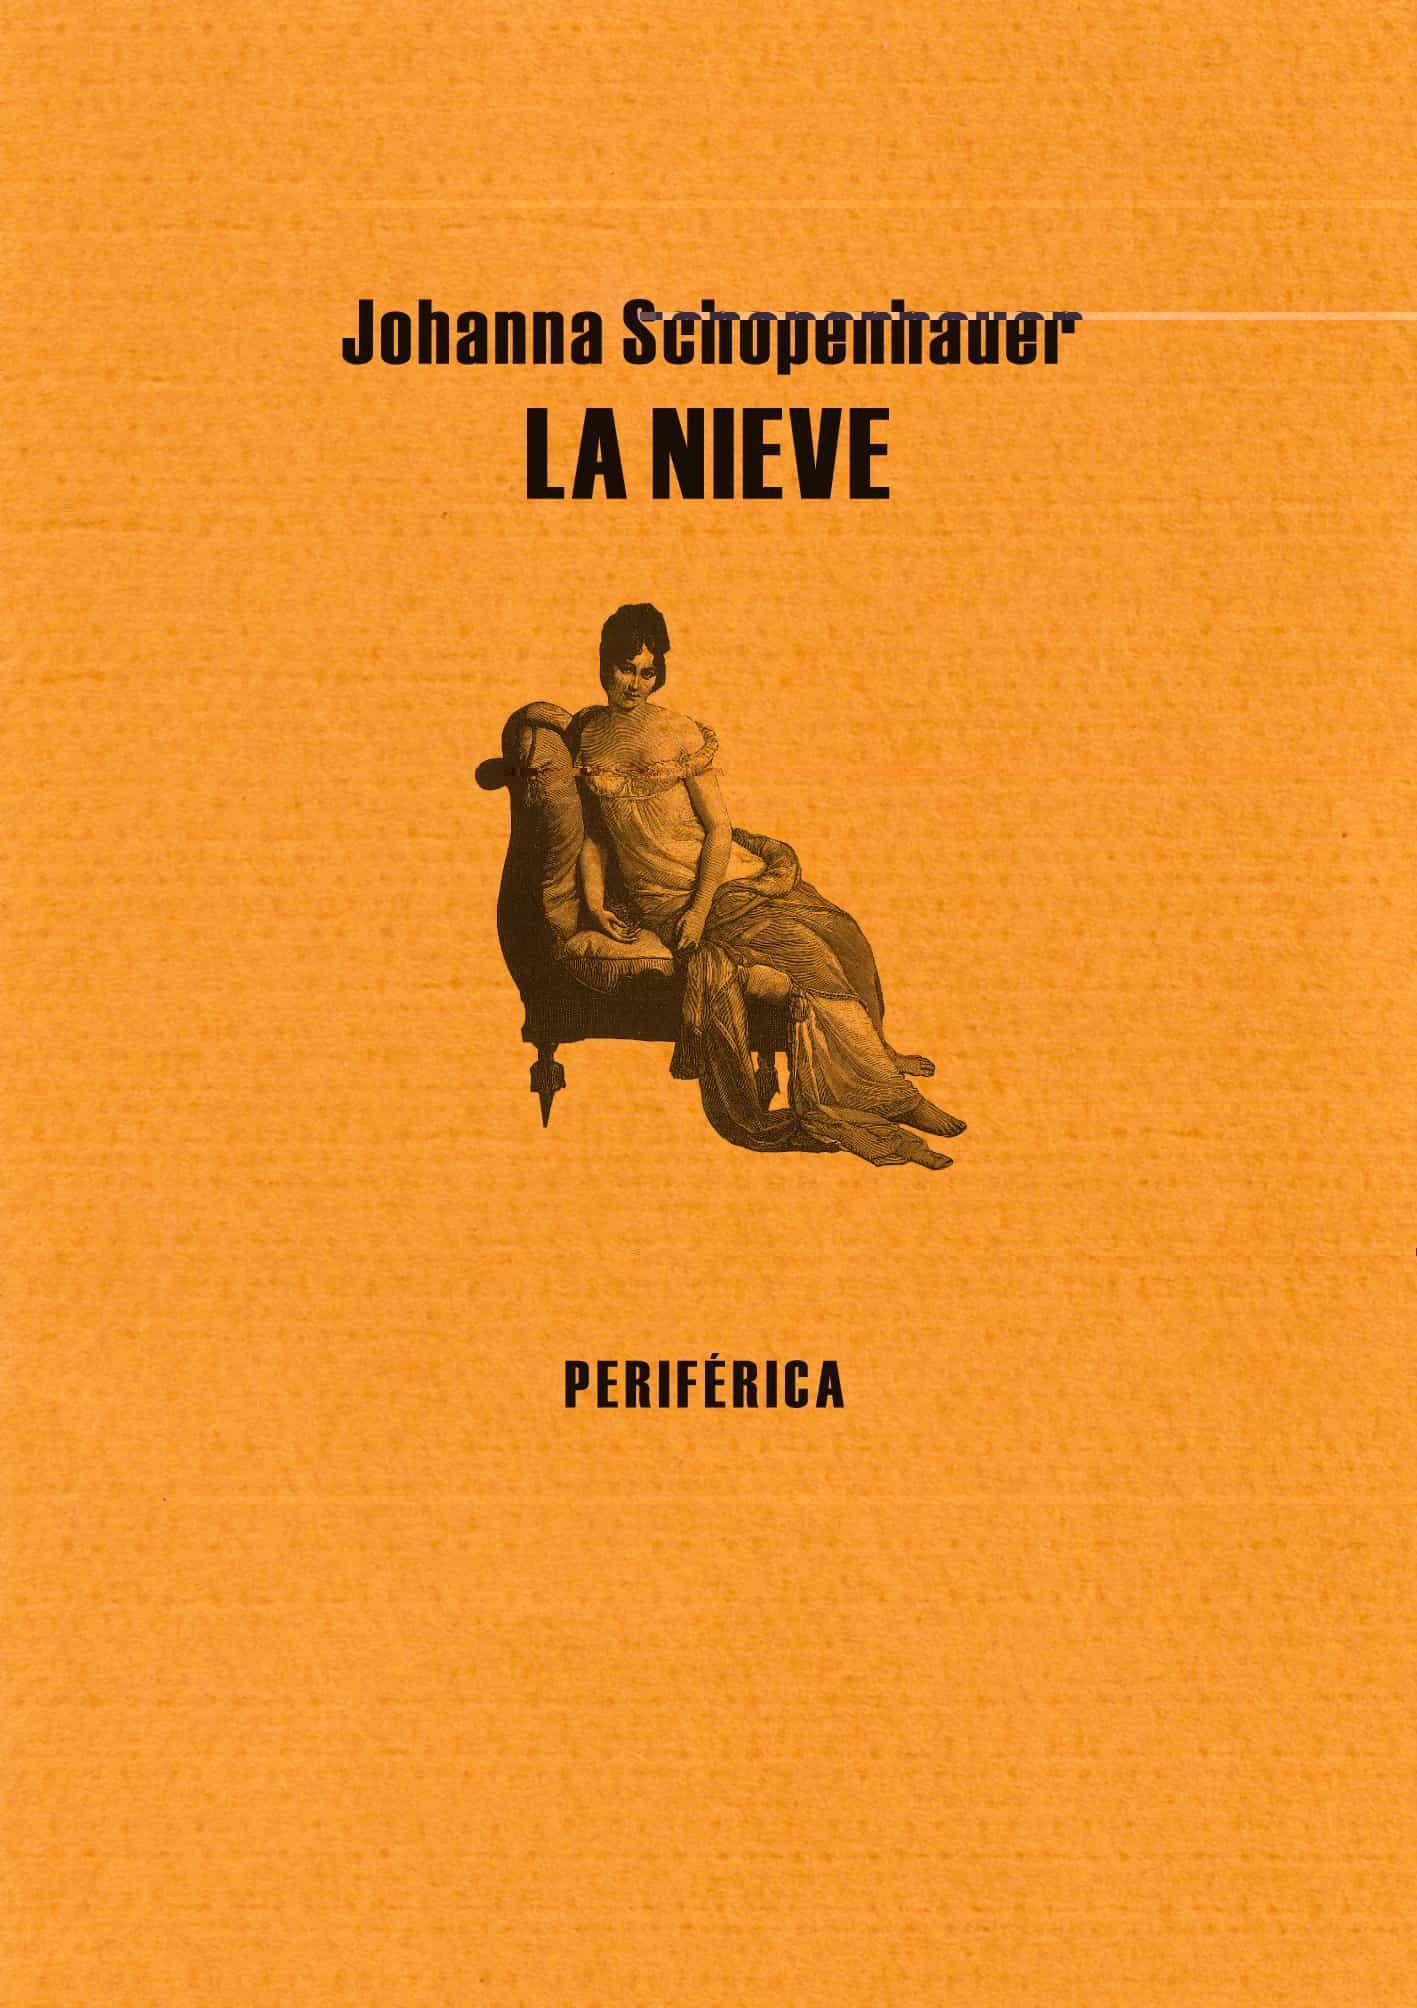 La Nieve por Johanna Schopenhauer